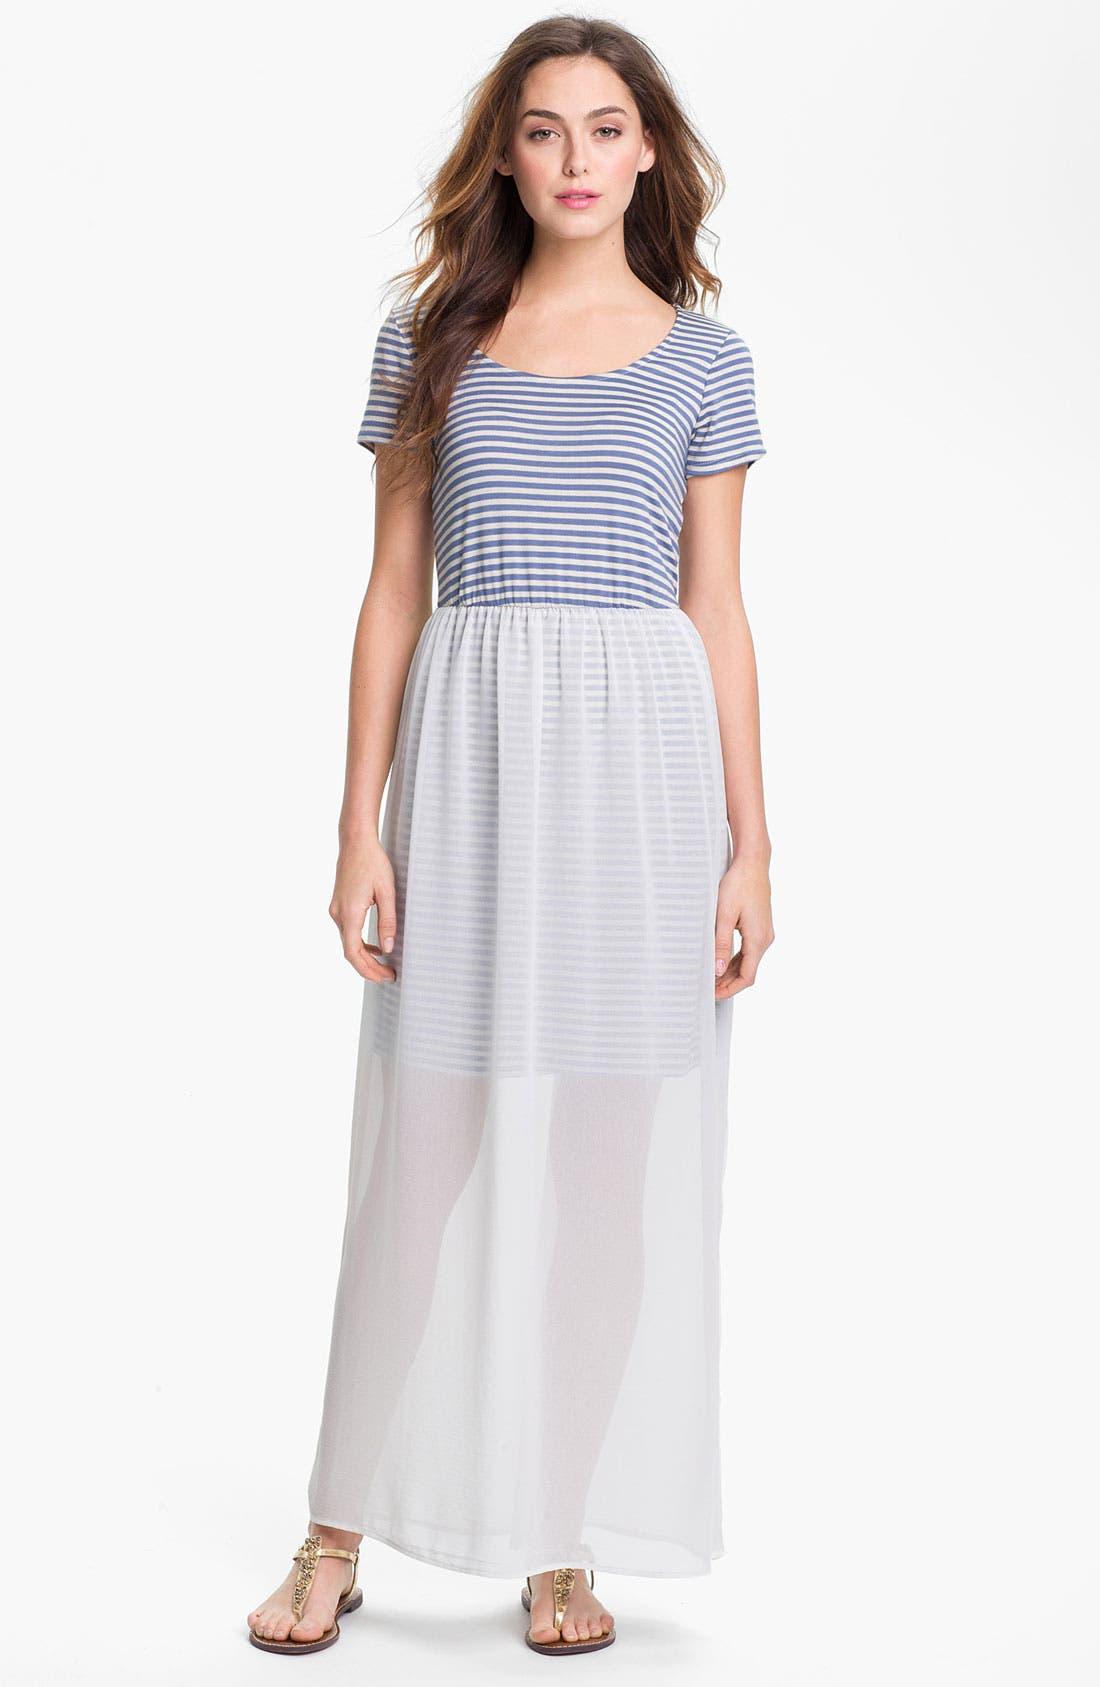 Alternate Image 1 Selected - MOD.lusive Chiffon Overlay Maxi Dress